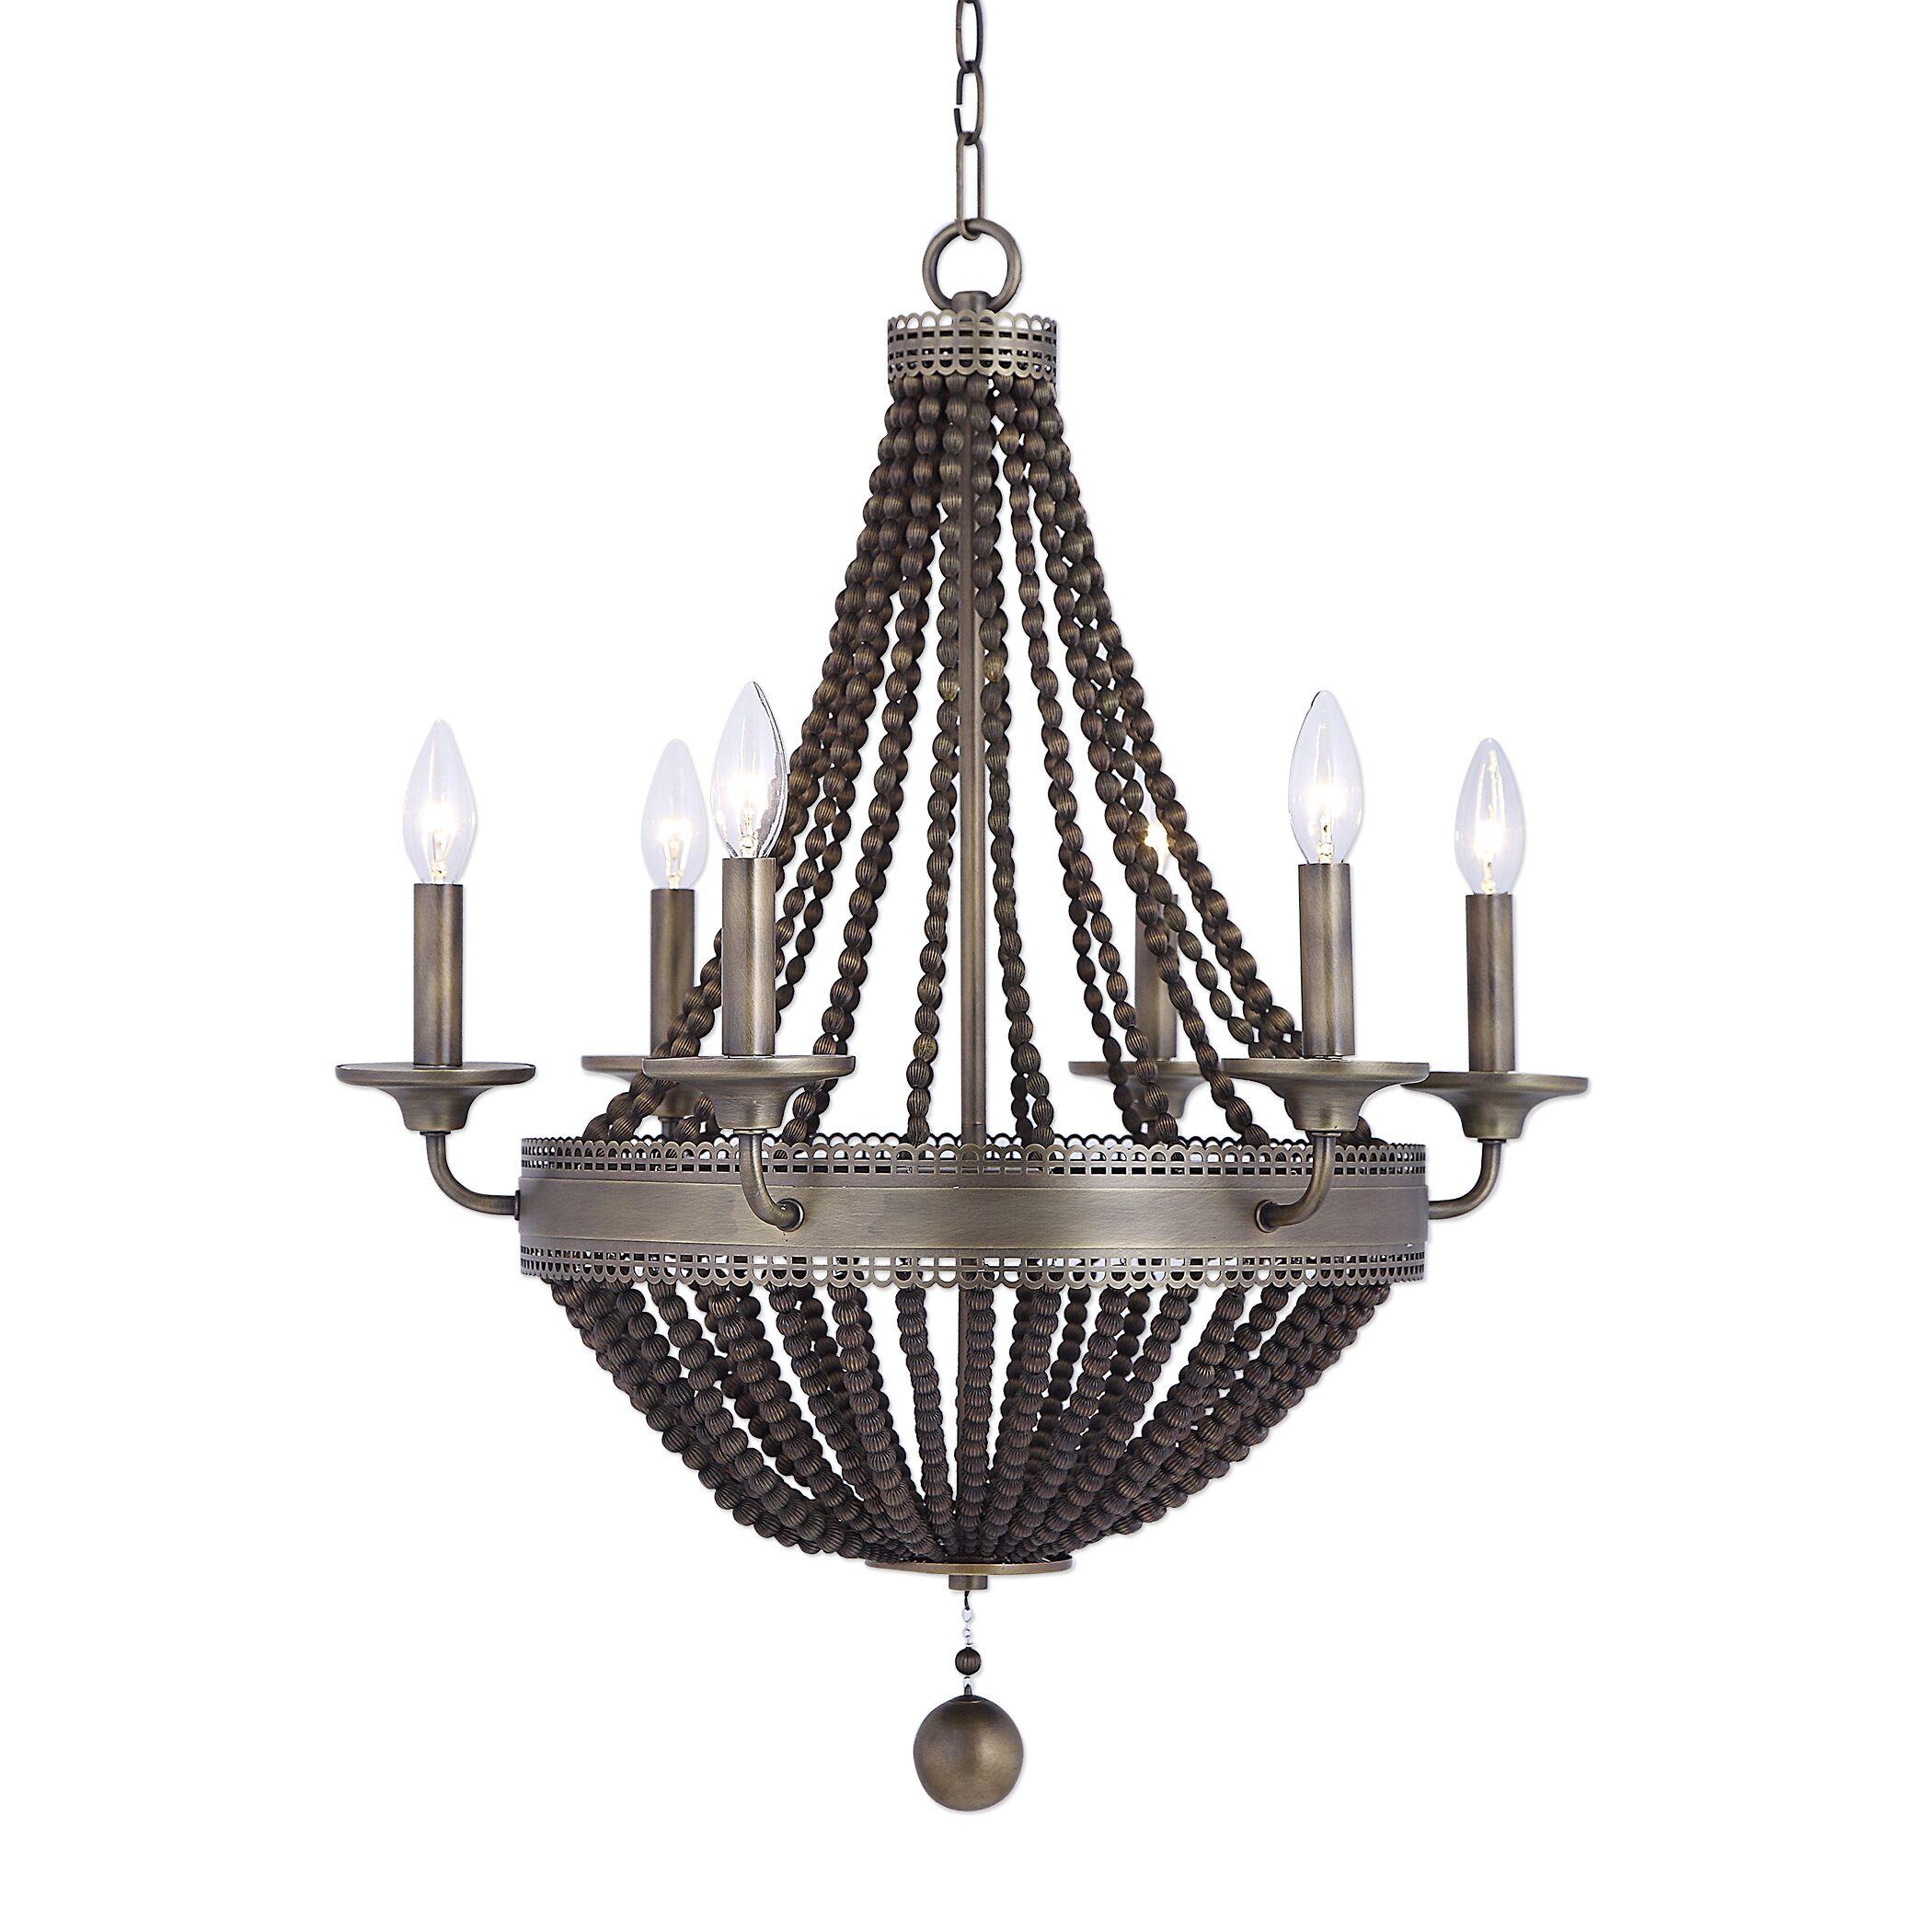 Atticus 6-Light LED Empire Chandelier